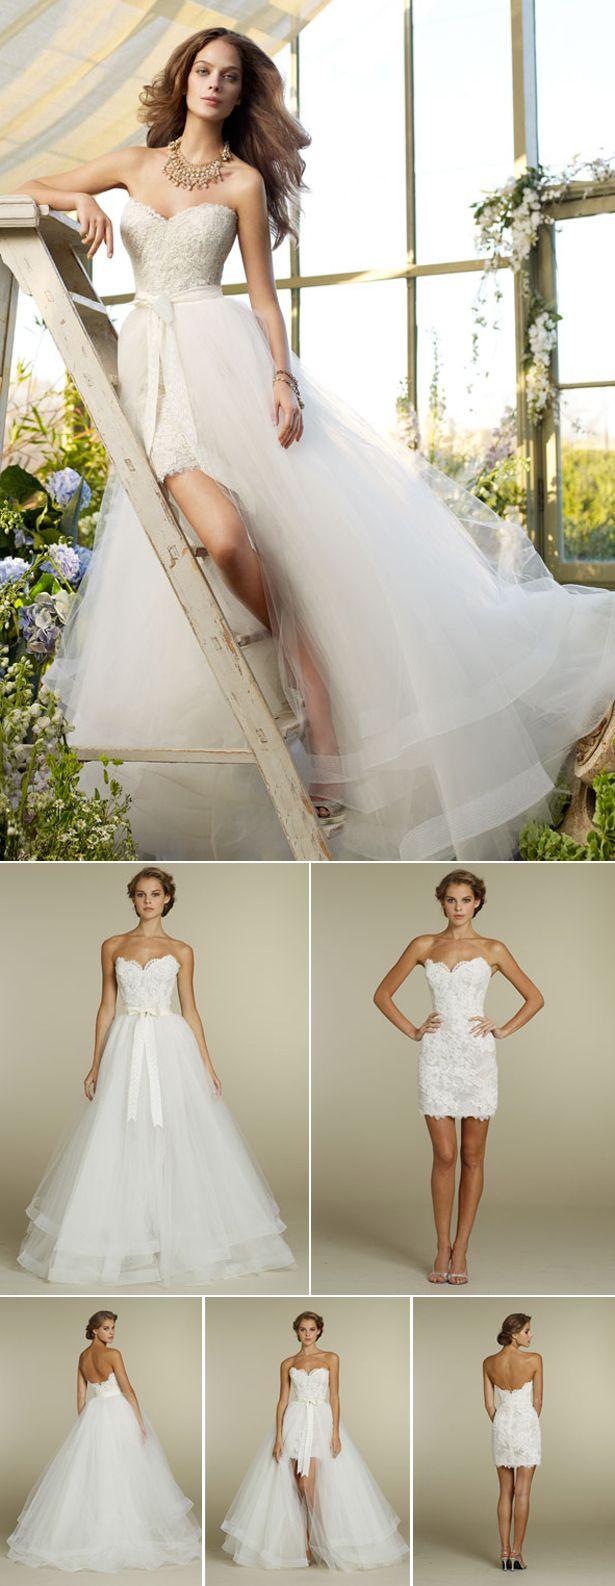 1940 wedding dress  Leora Pearson leora on Pinterest